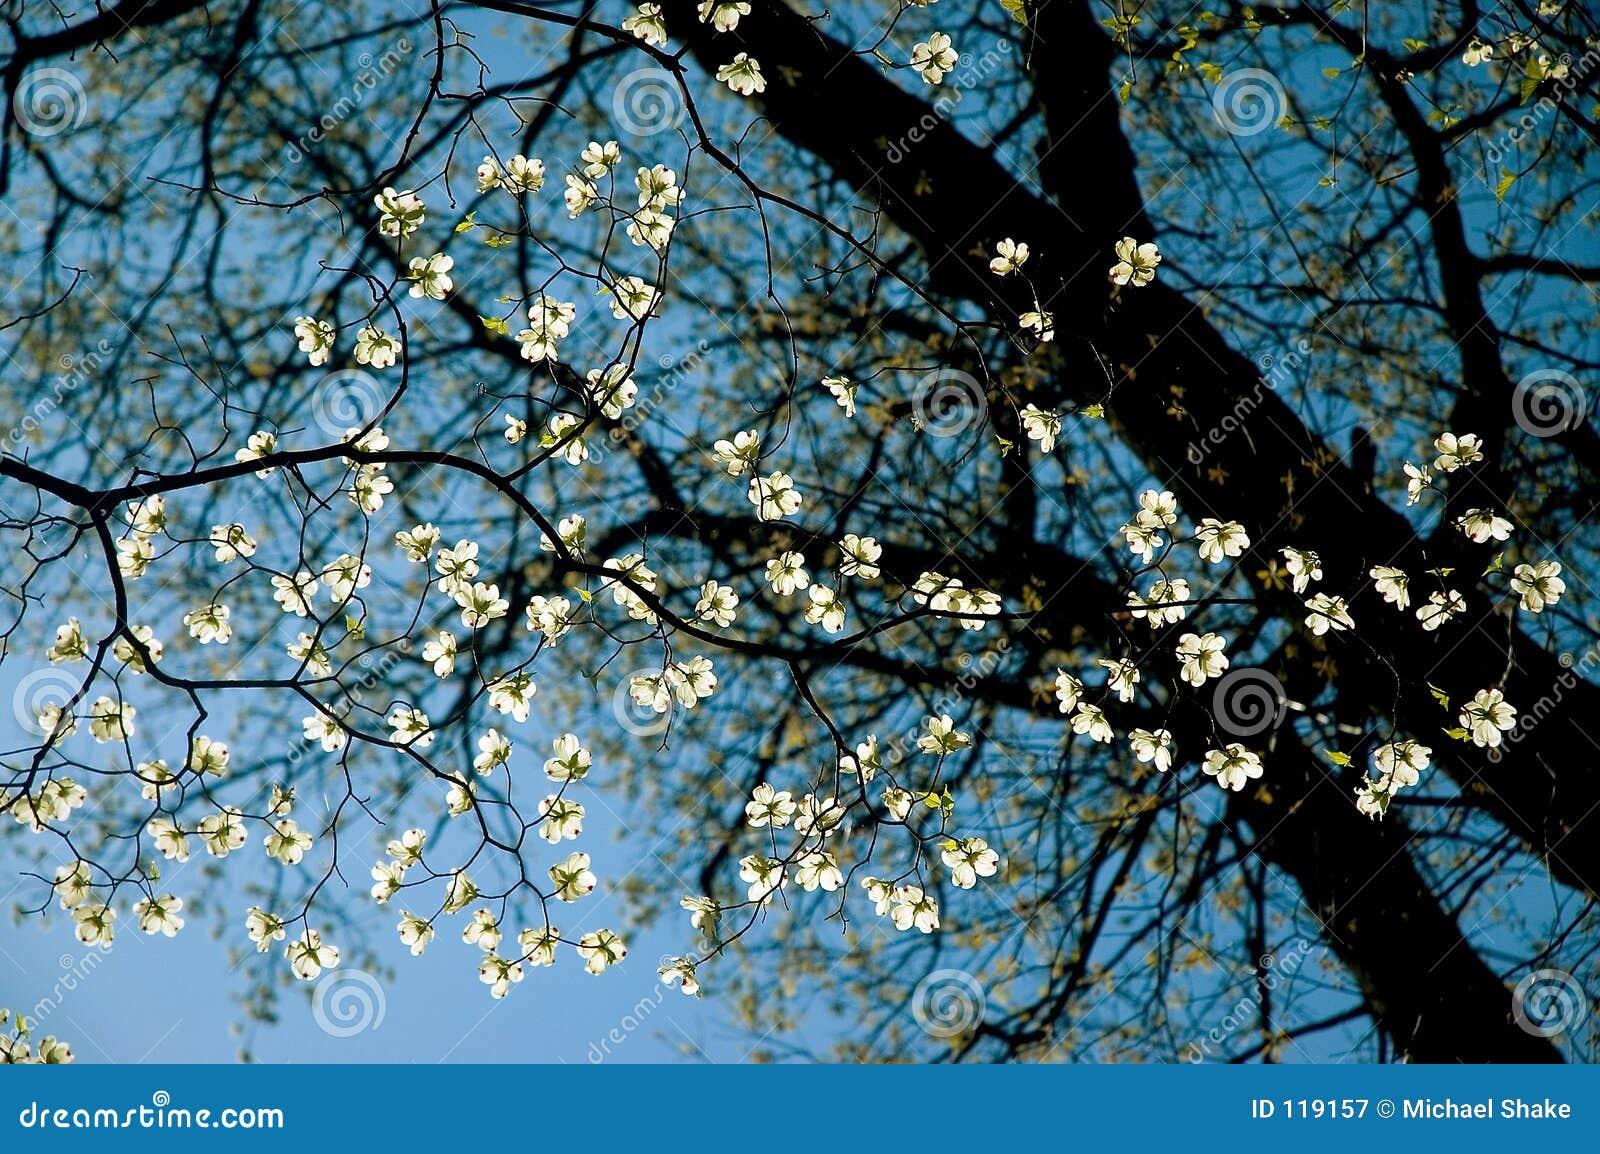 Dogwood Tree Close-Up